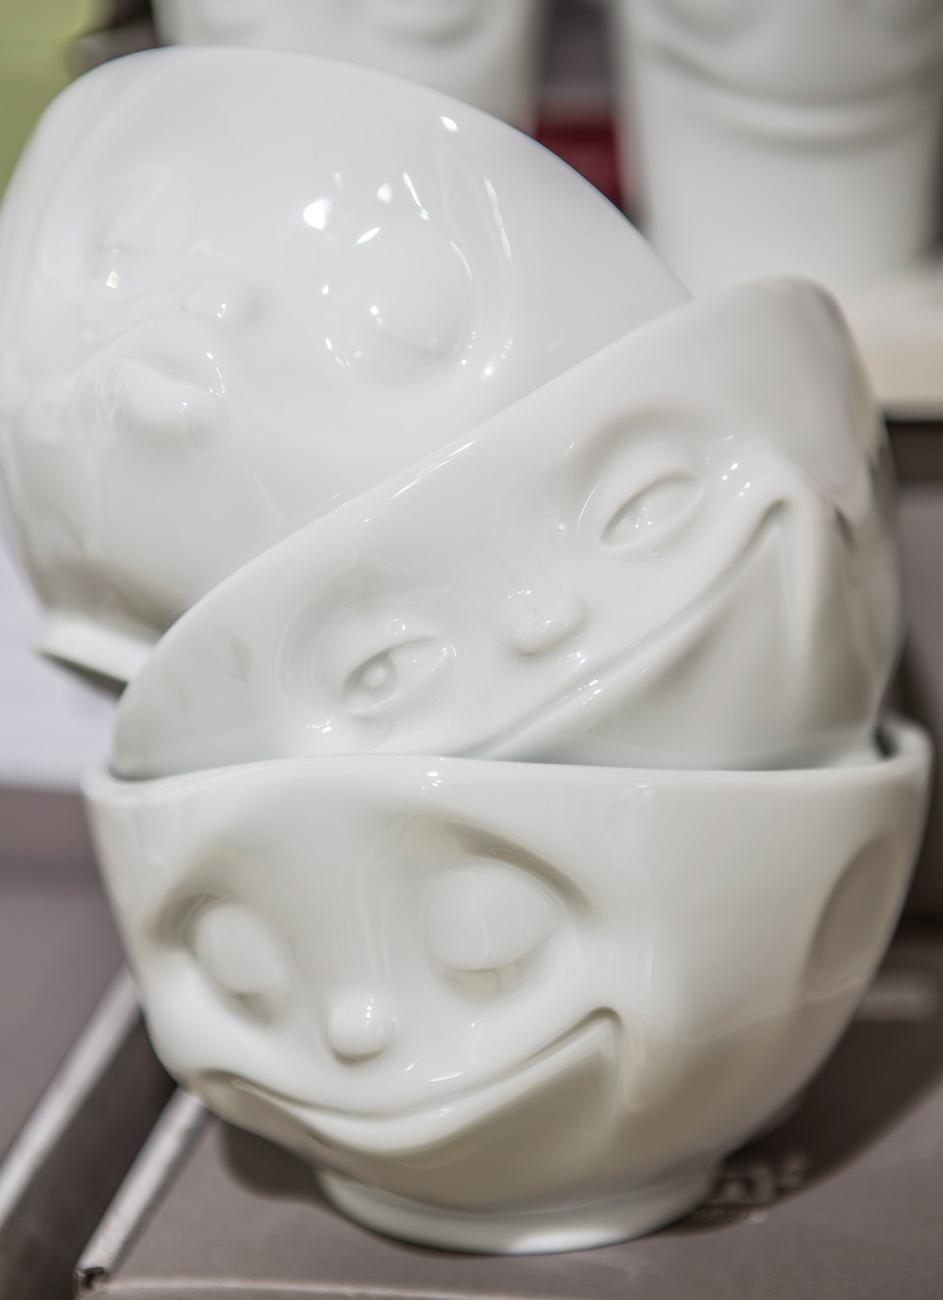 skien-by-bikuben-kopper-ansikter